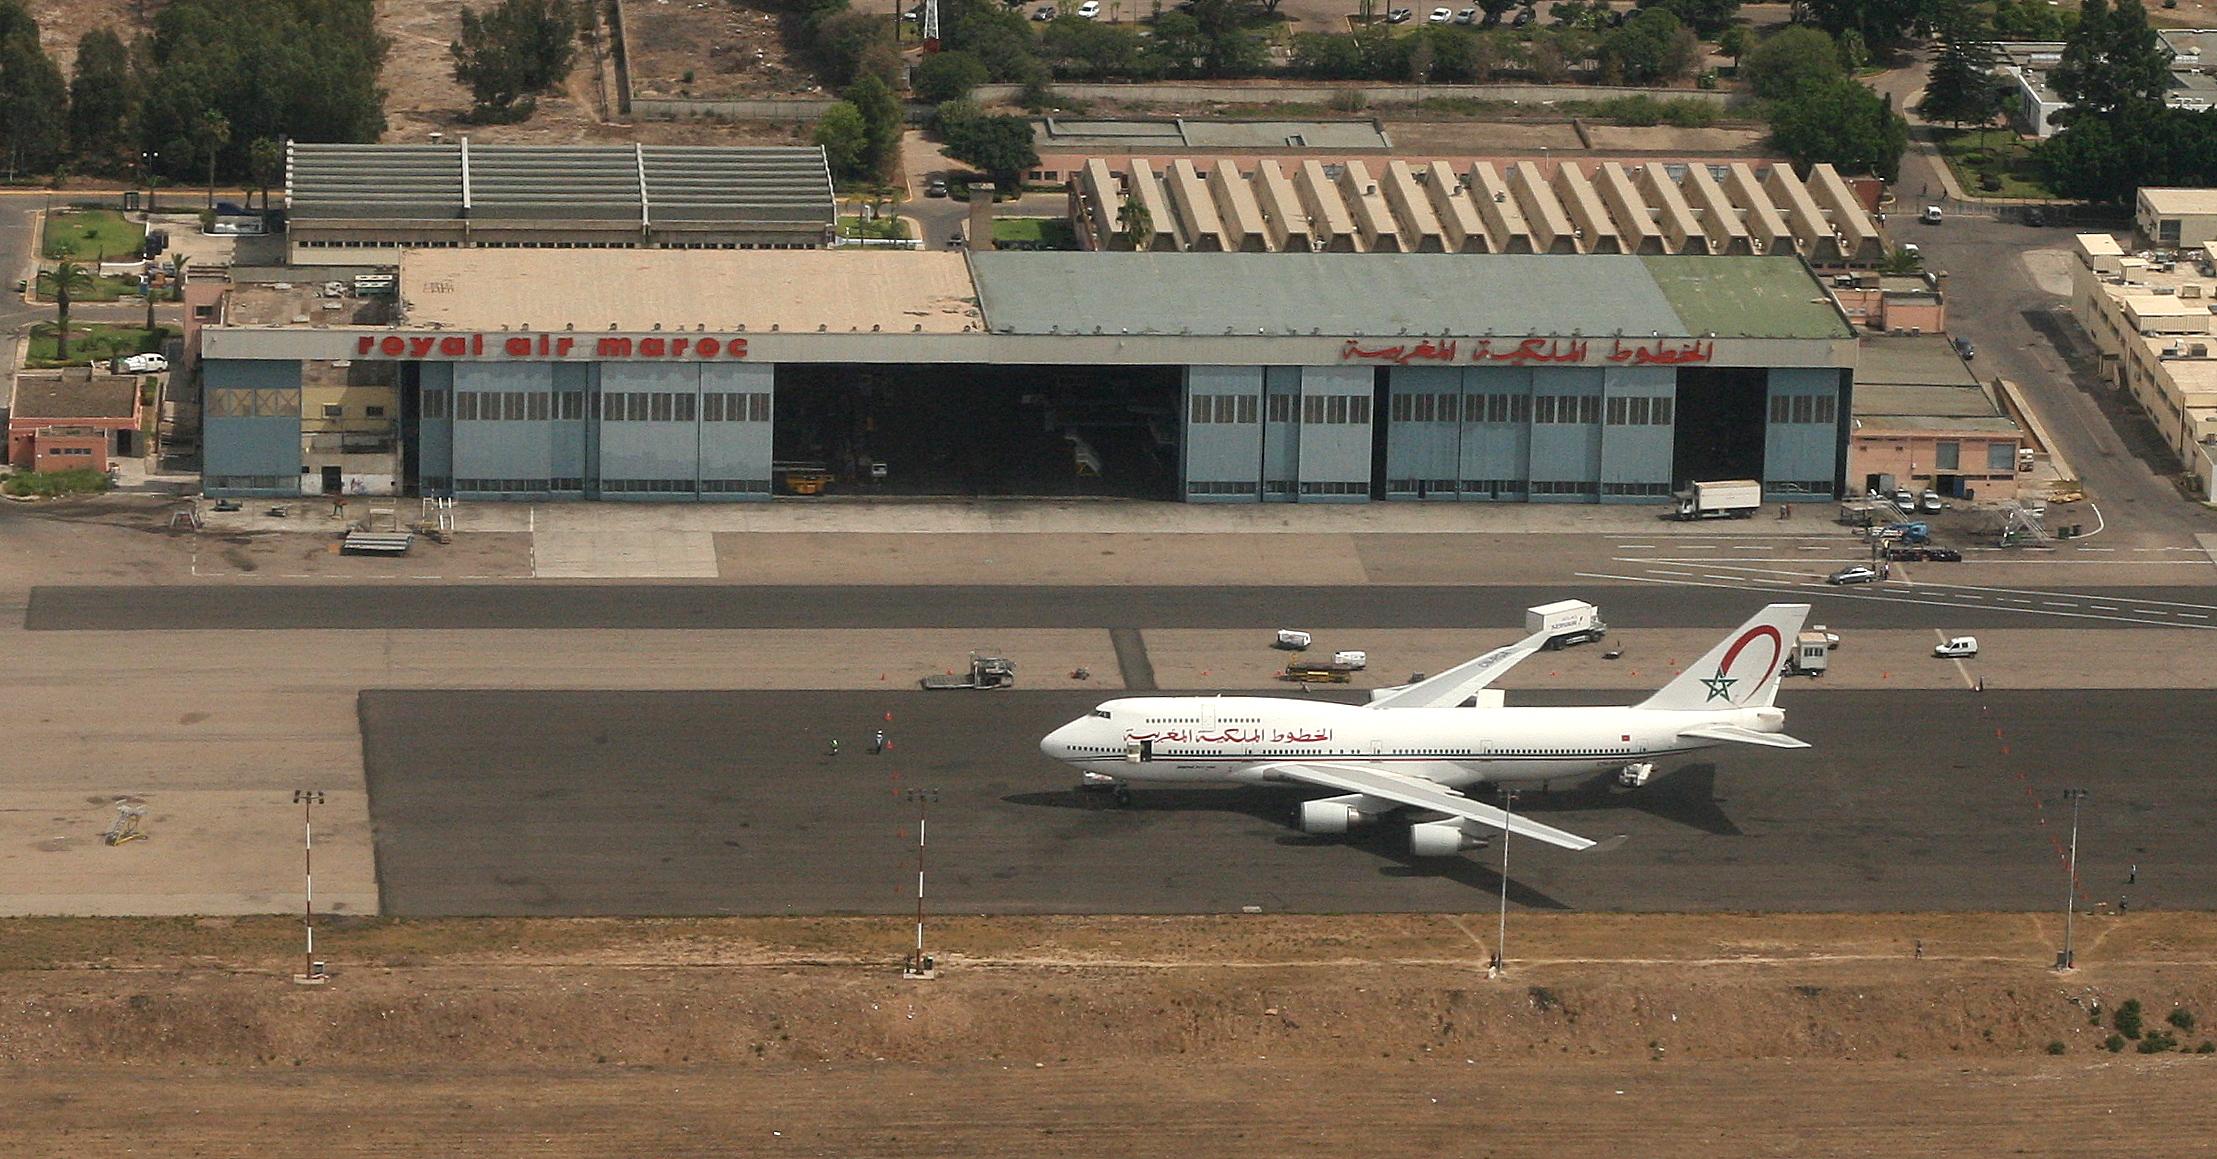 Royal Air Maroc - Page 14 15132050448_0da821f08c_o